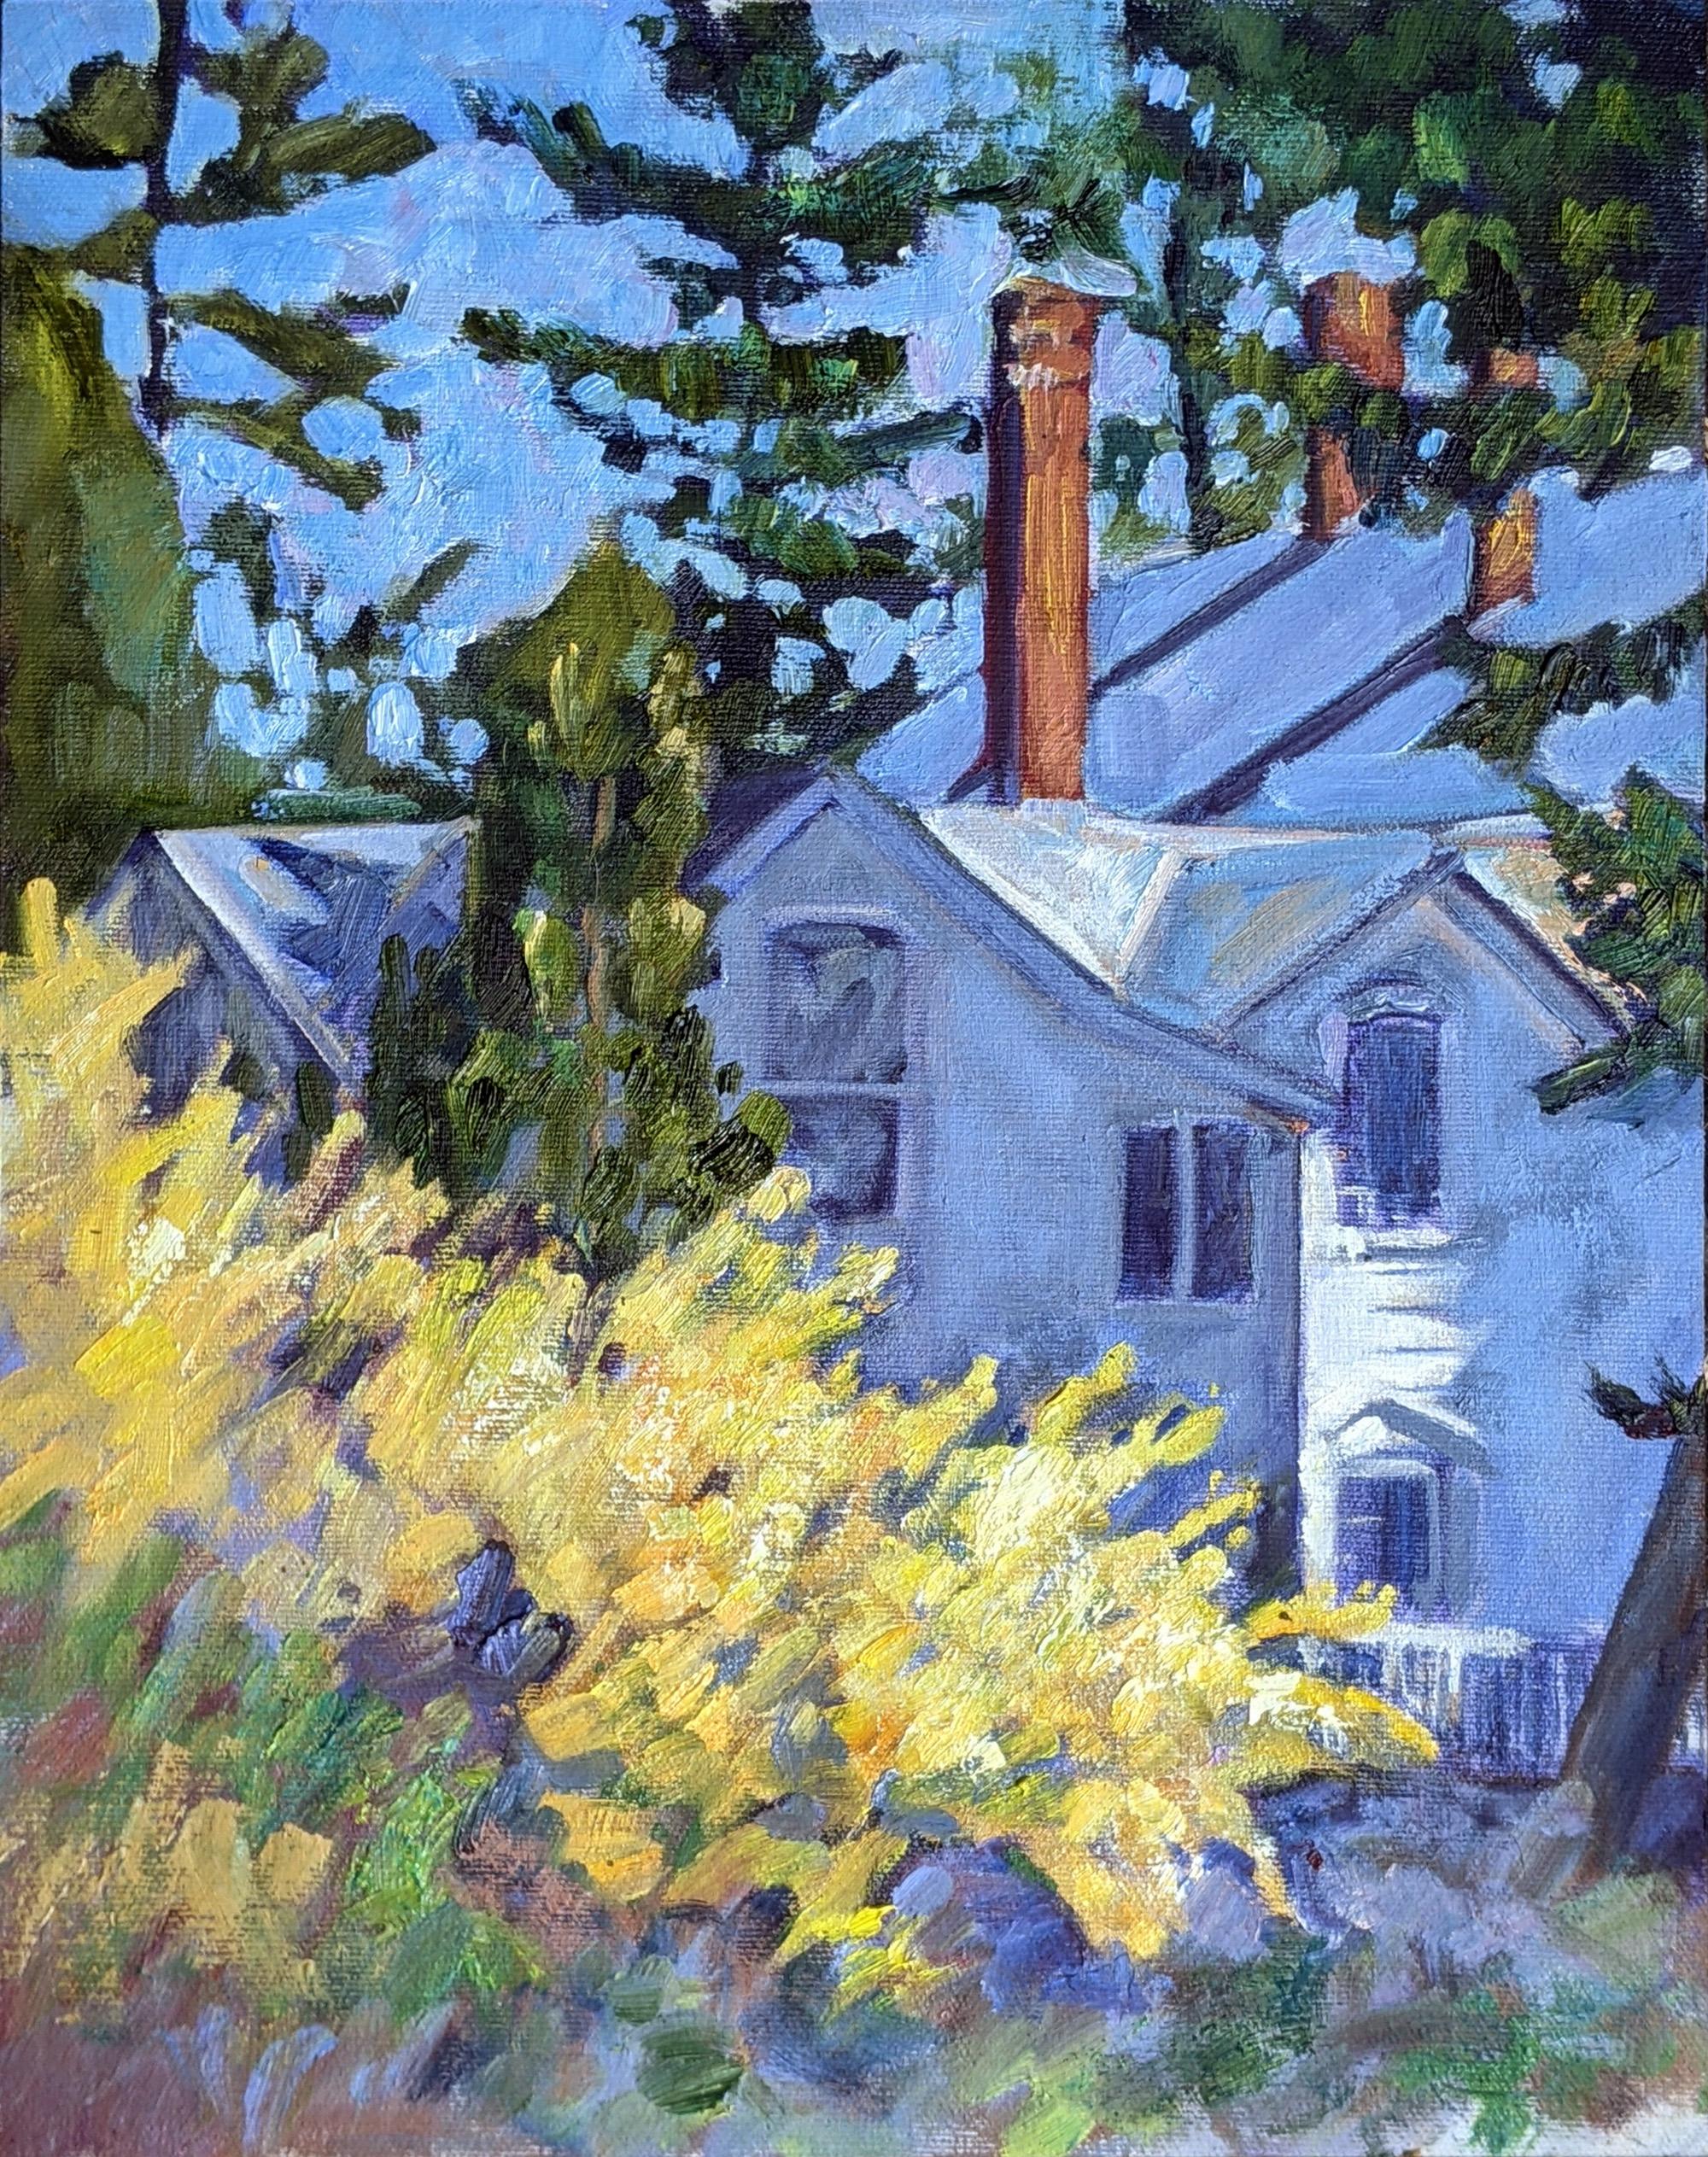 """Three Chimneys,"" 12X16, oil on canvasboard, $1, 159 unframed."